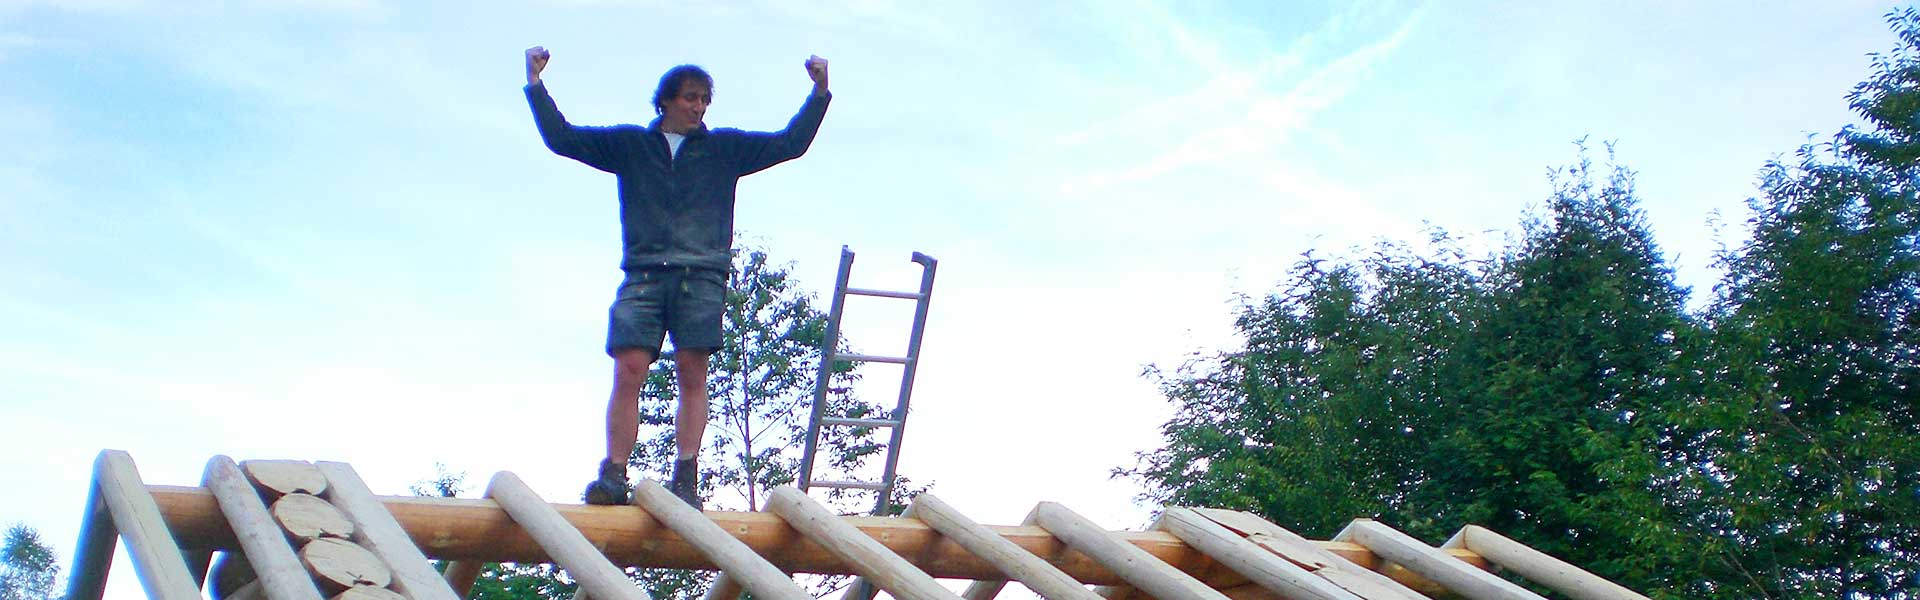 Jobs im Holzbau